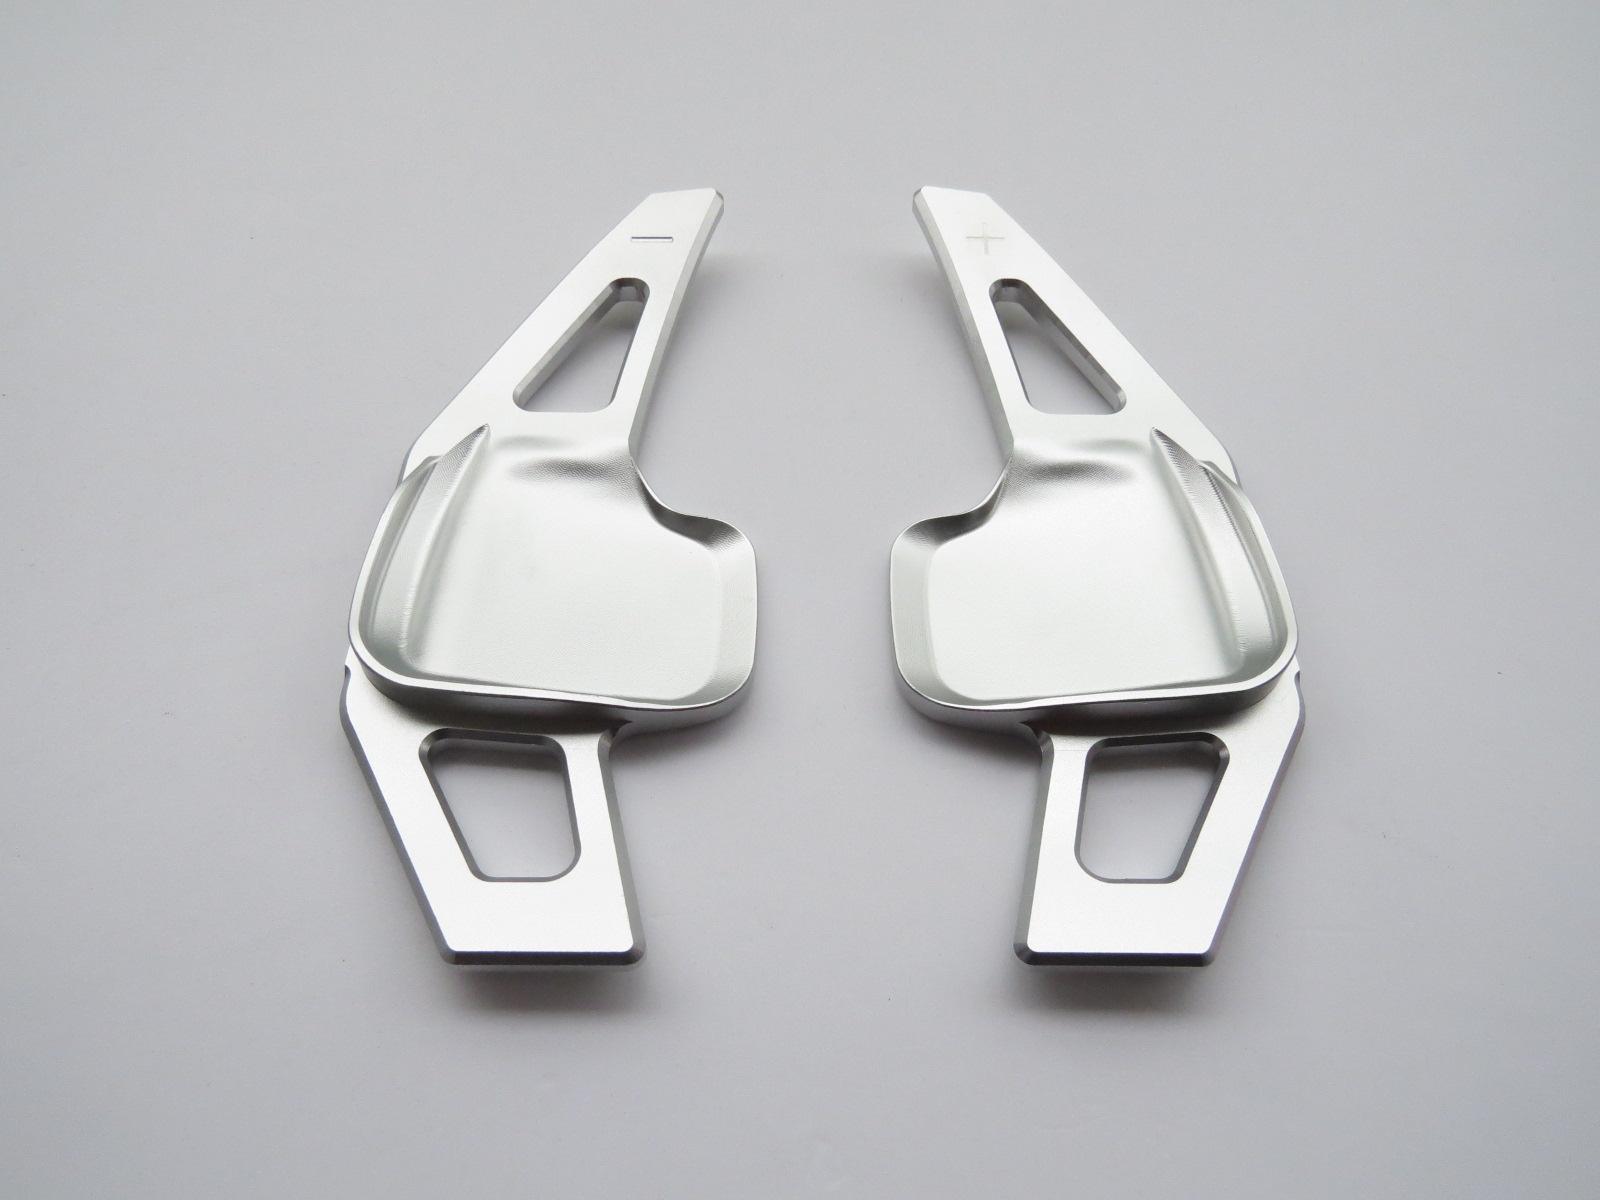 Pinalloy Silber alloy Schaltwippen Schaltpaddel BMW F10 F15 F20 F26 F30 F32 F33